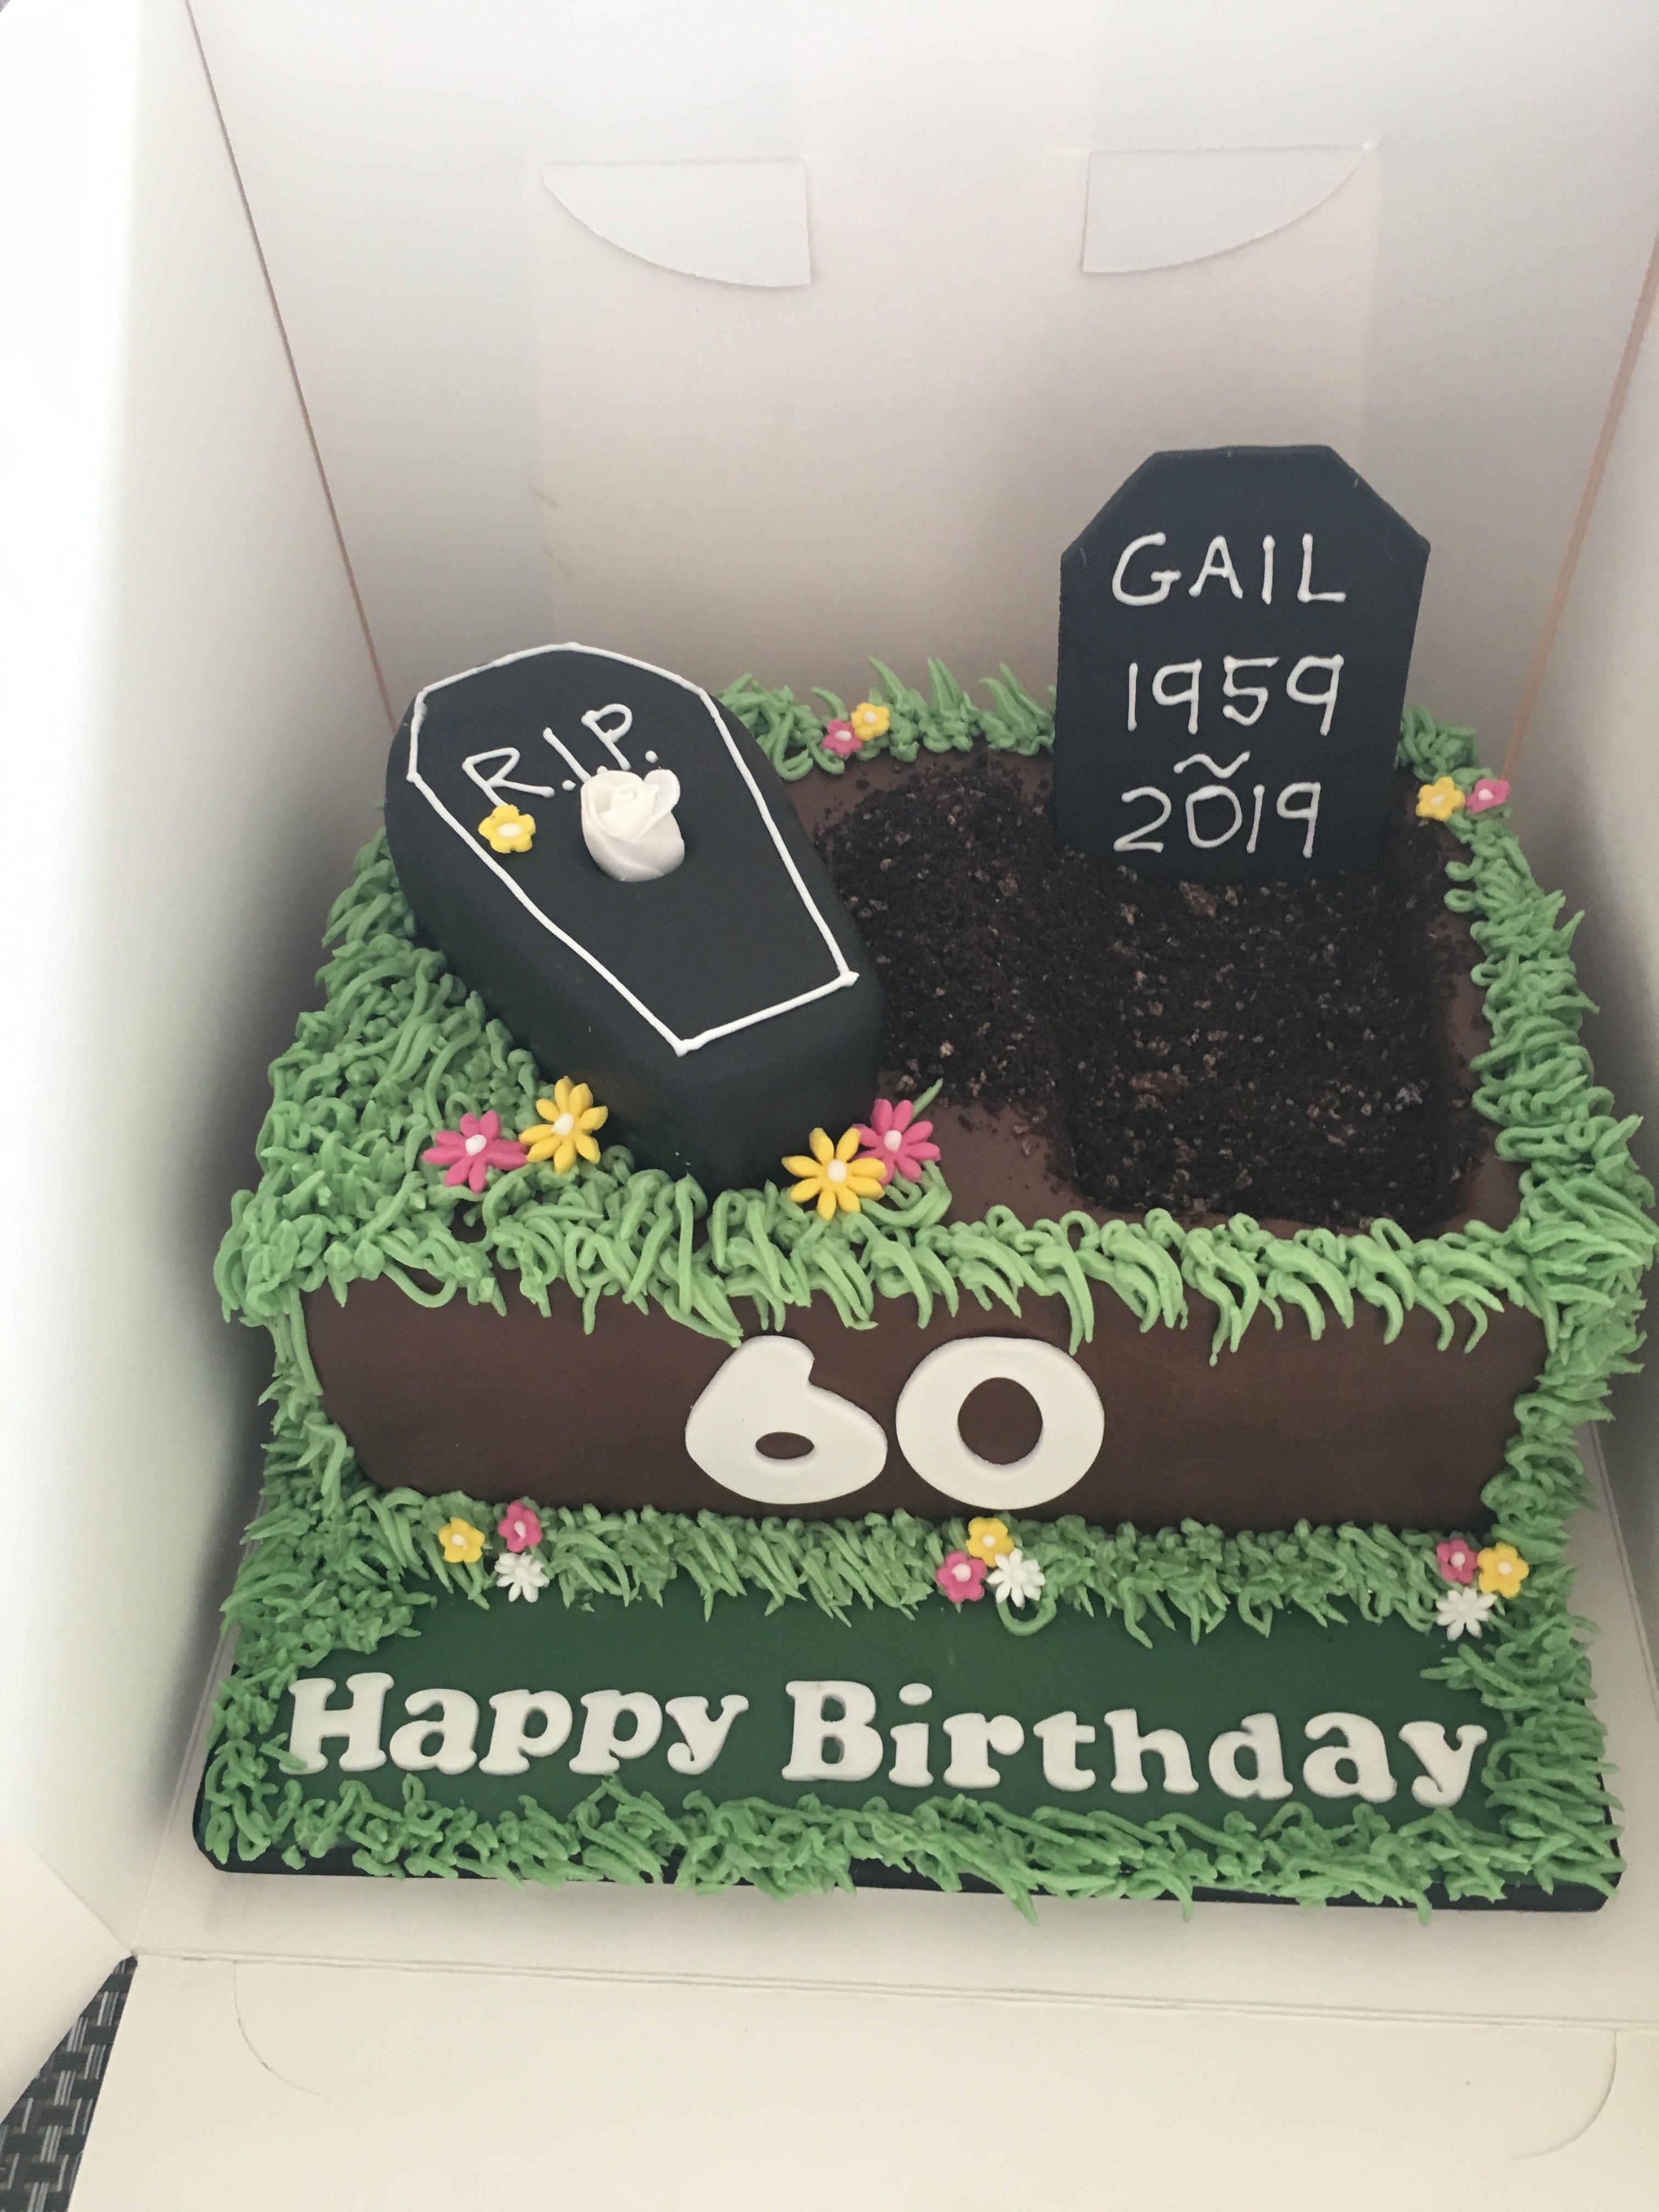 Astounding Funny 60Th Birthday Cake 60Th Birthday Cakes Funny Birthday Cards Online Fluifree Goldxyz